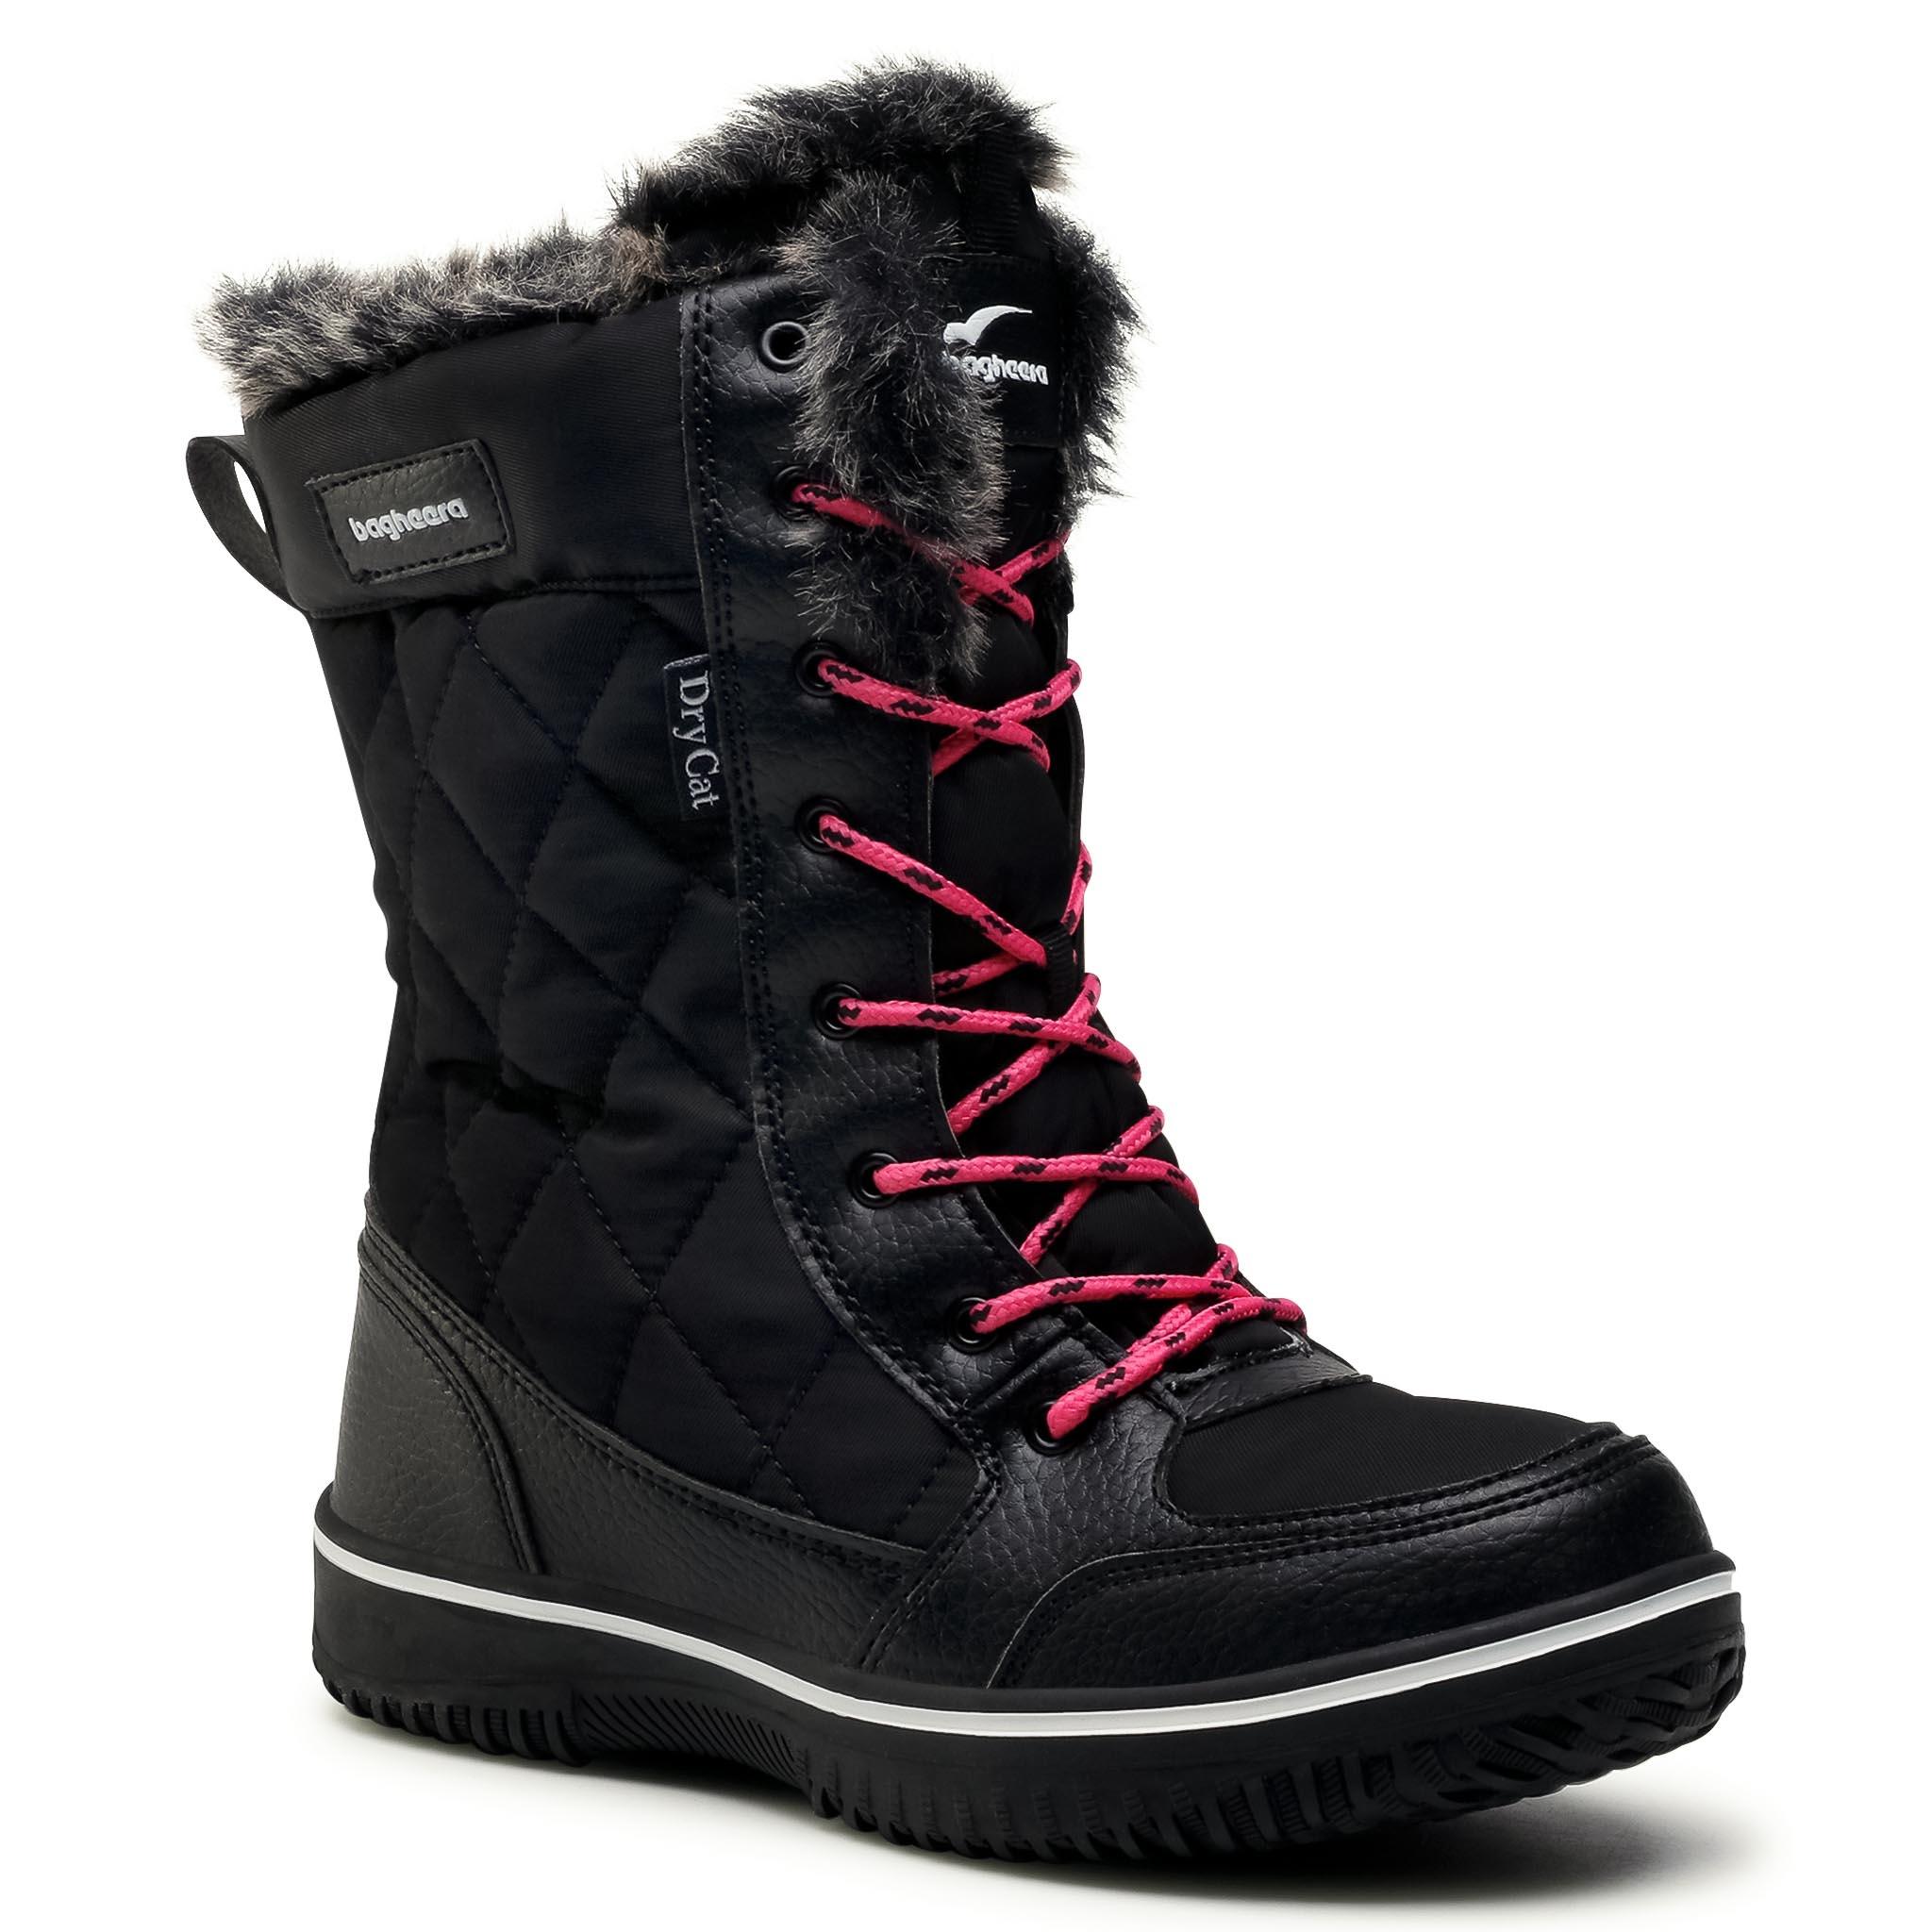 Image of Schneeschuhe BAGHEERA - Frost 86223-4 C0100 Black